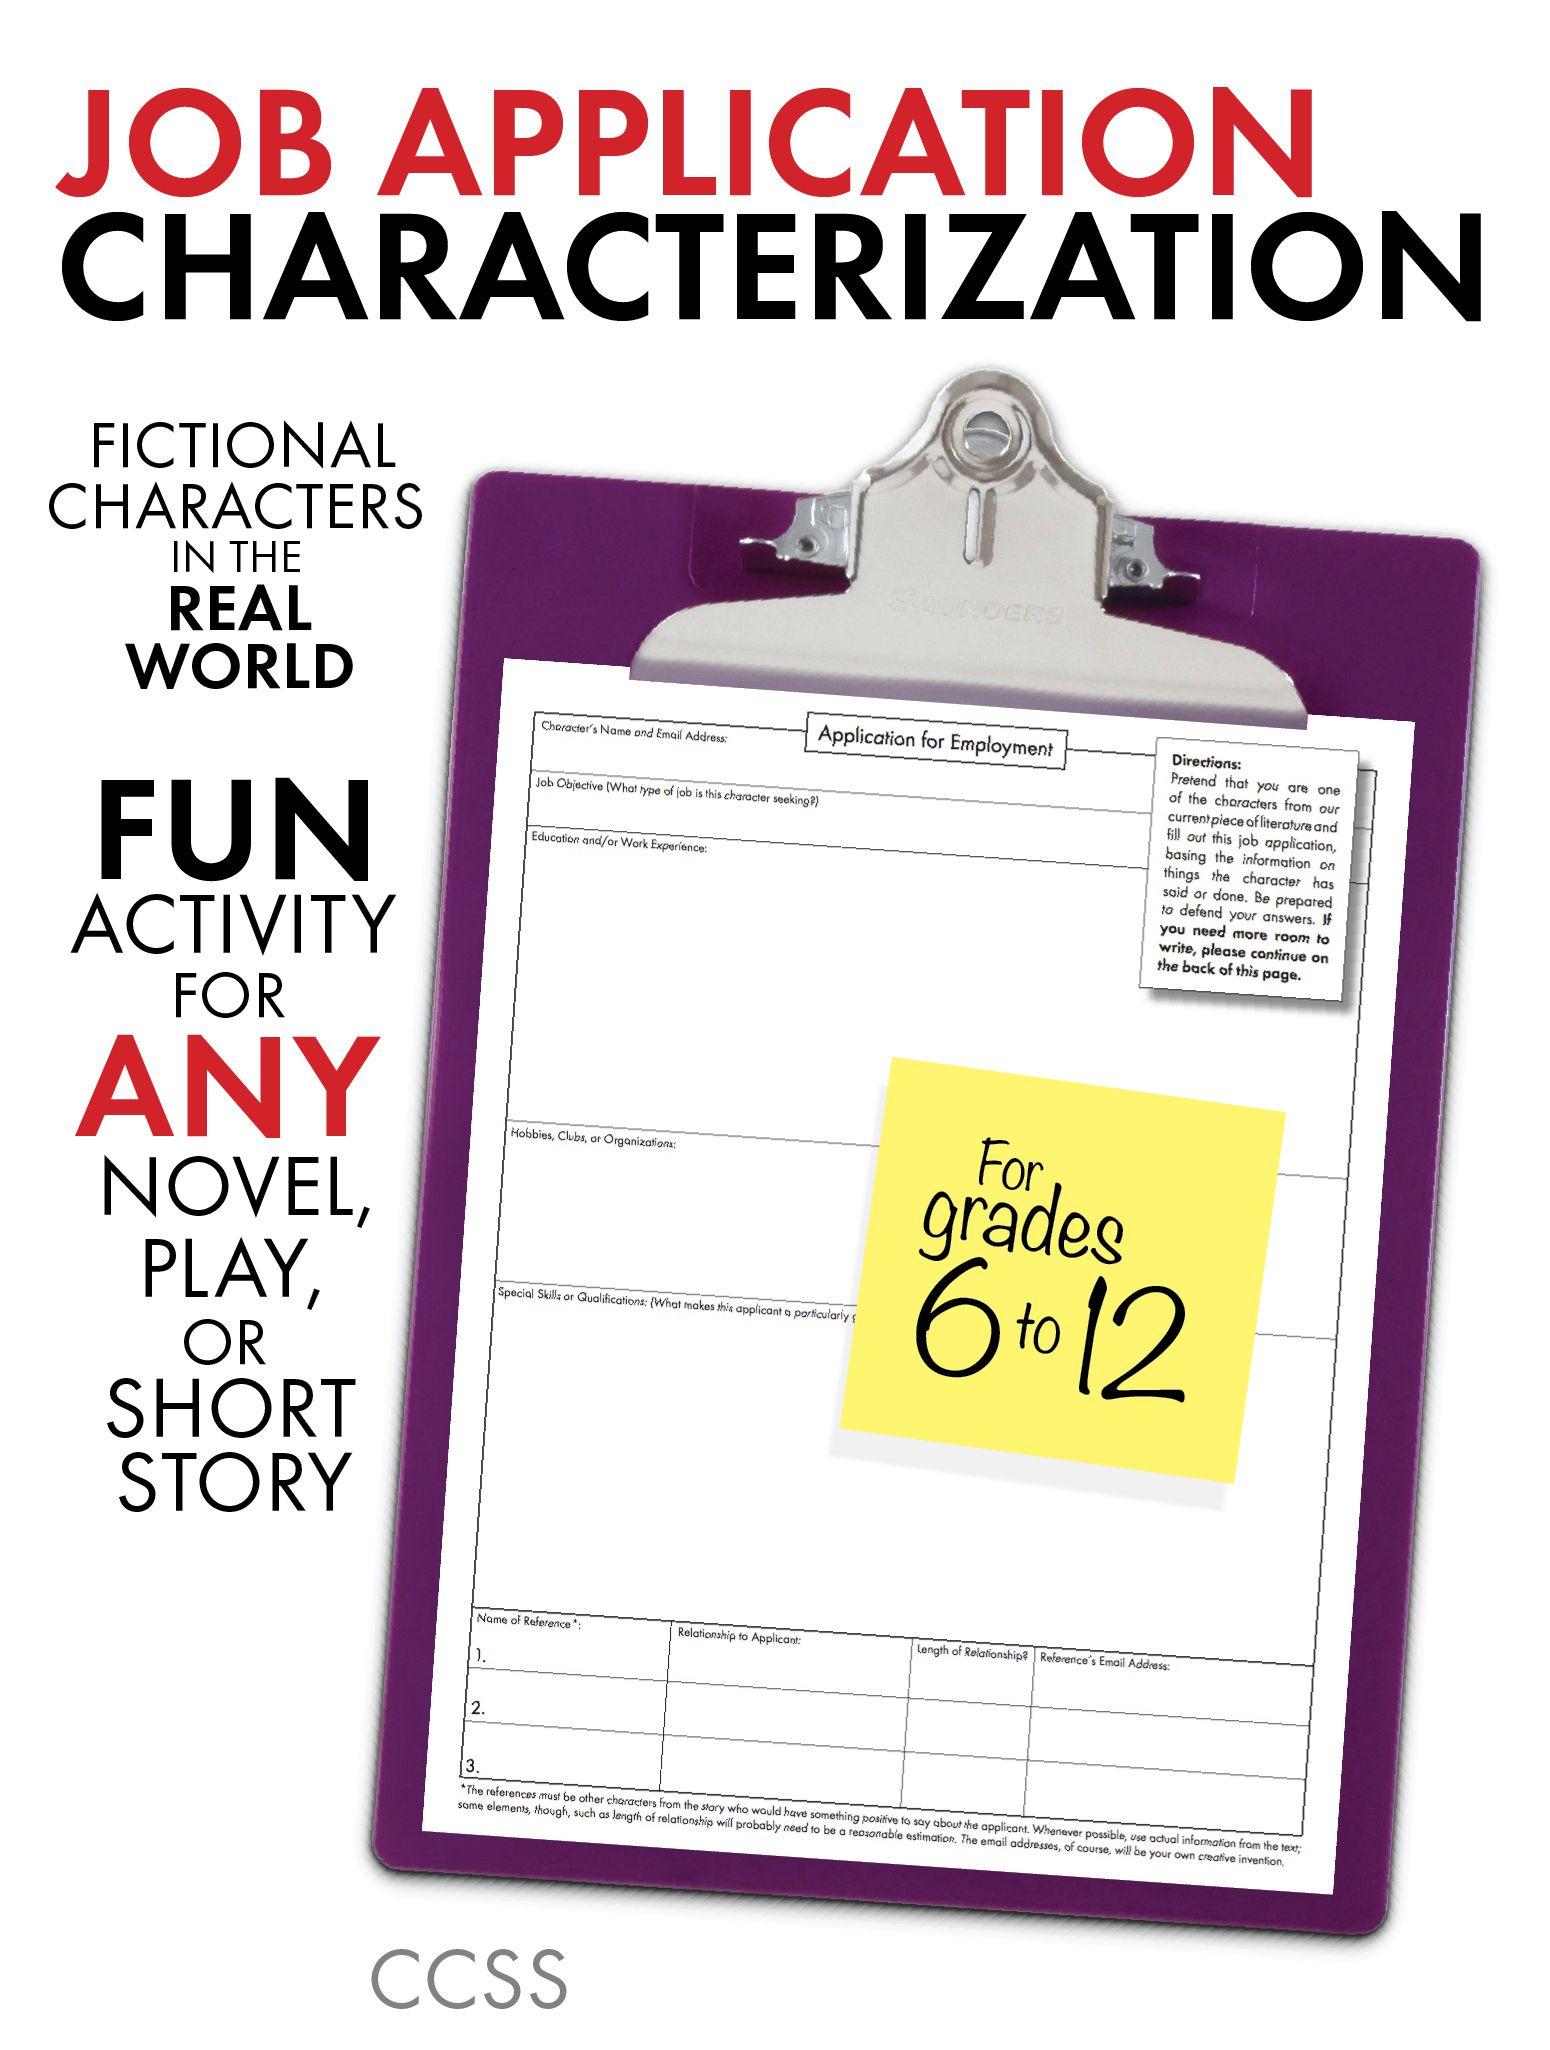 Job Application Characterization Fun Stuff Use With Any